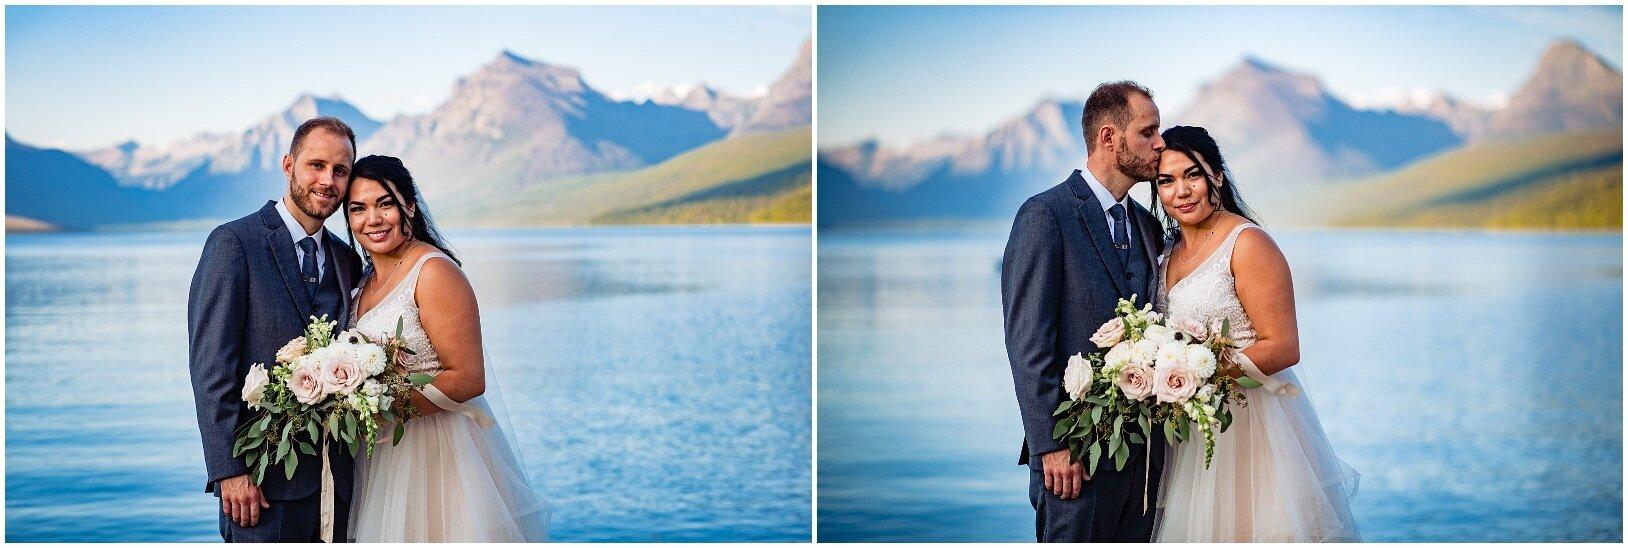 lindseyjanephoto_elopement0080.jpg